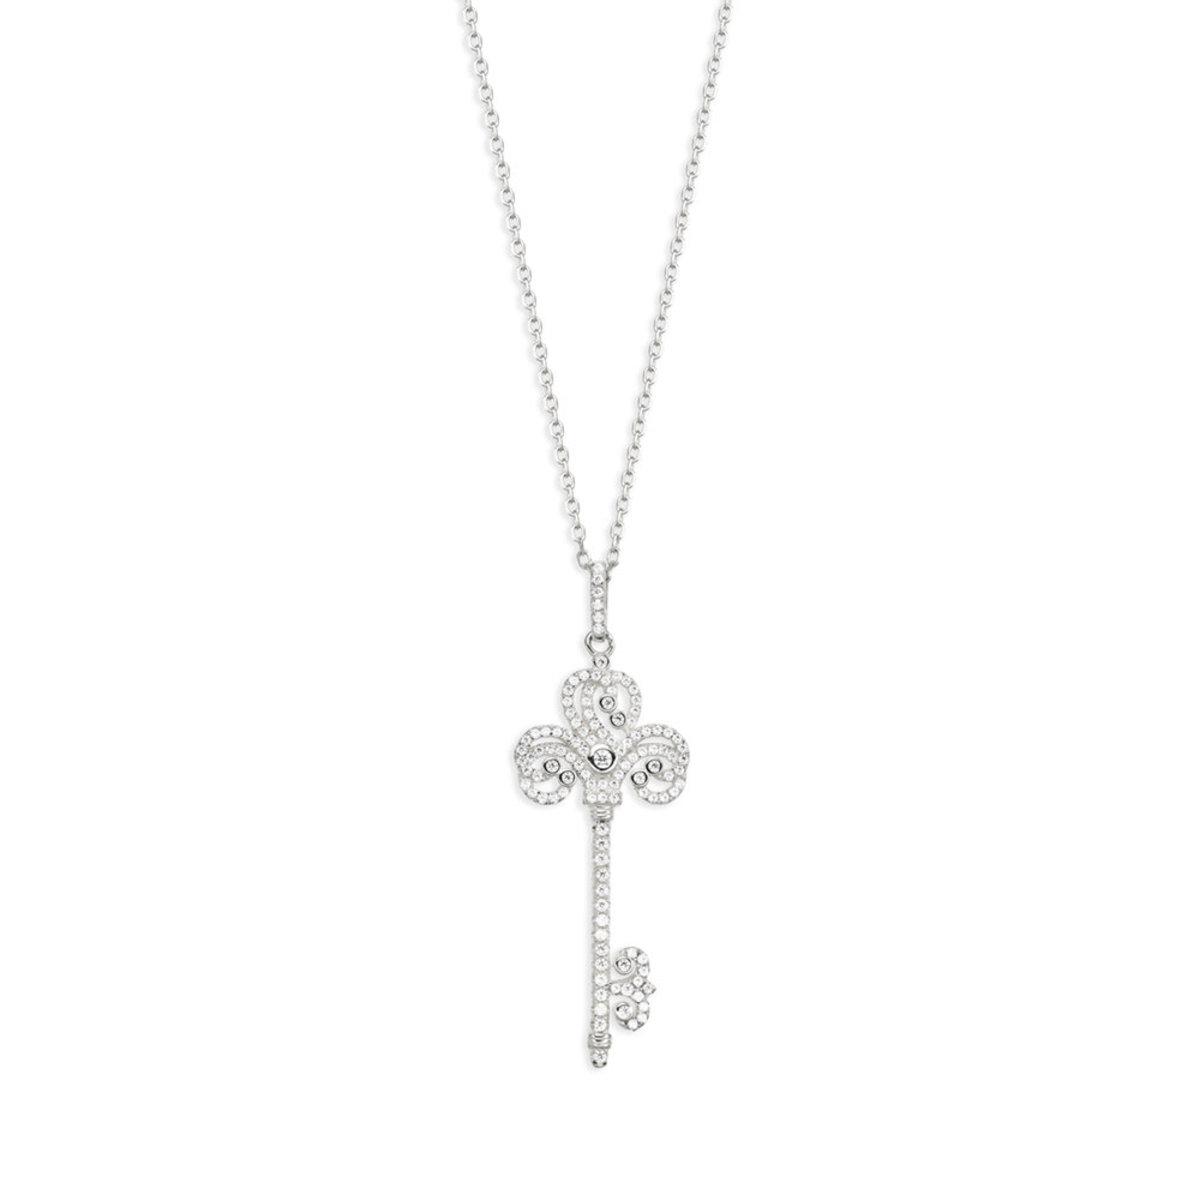 Precious Key: 925 silver, CZ stone necklace